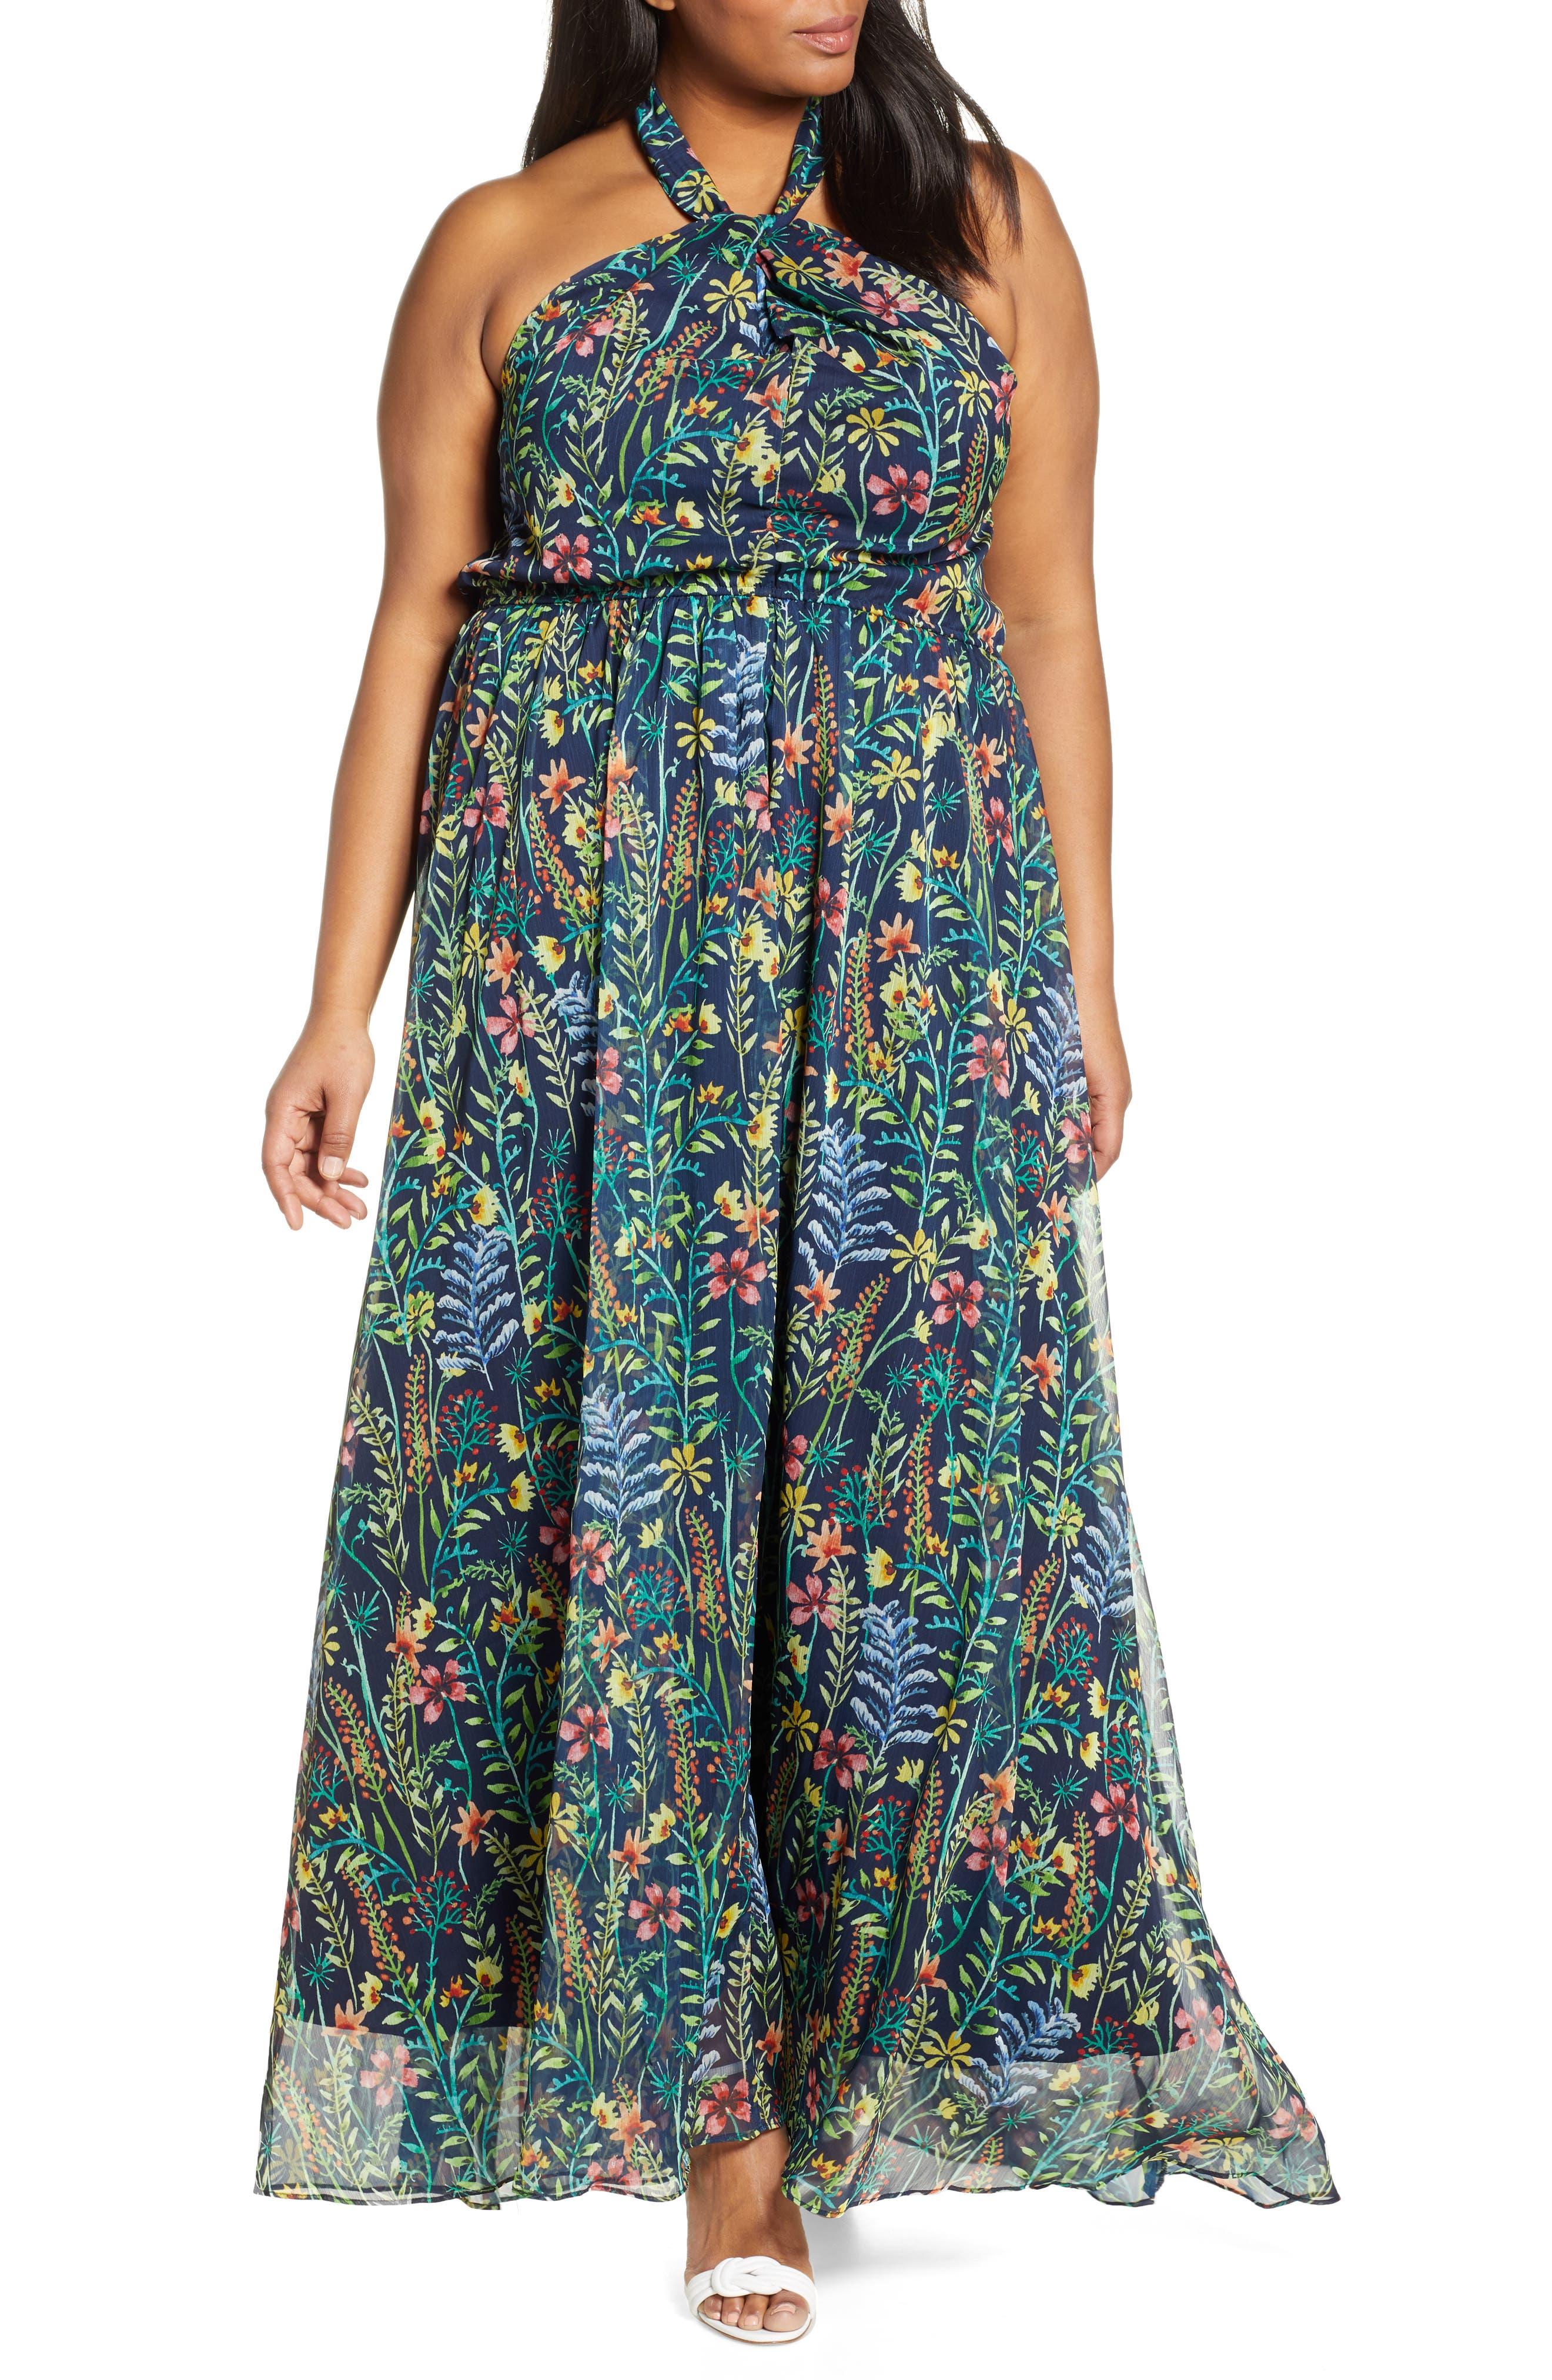 Jason Wu x ELOQUII Floral Print Halter Maxi Dress, Main, color, SO LITTLE THYME - NAVY GROUND